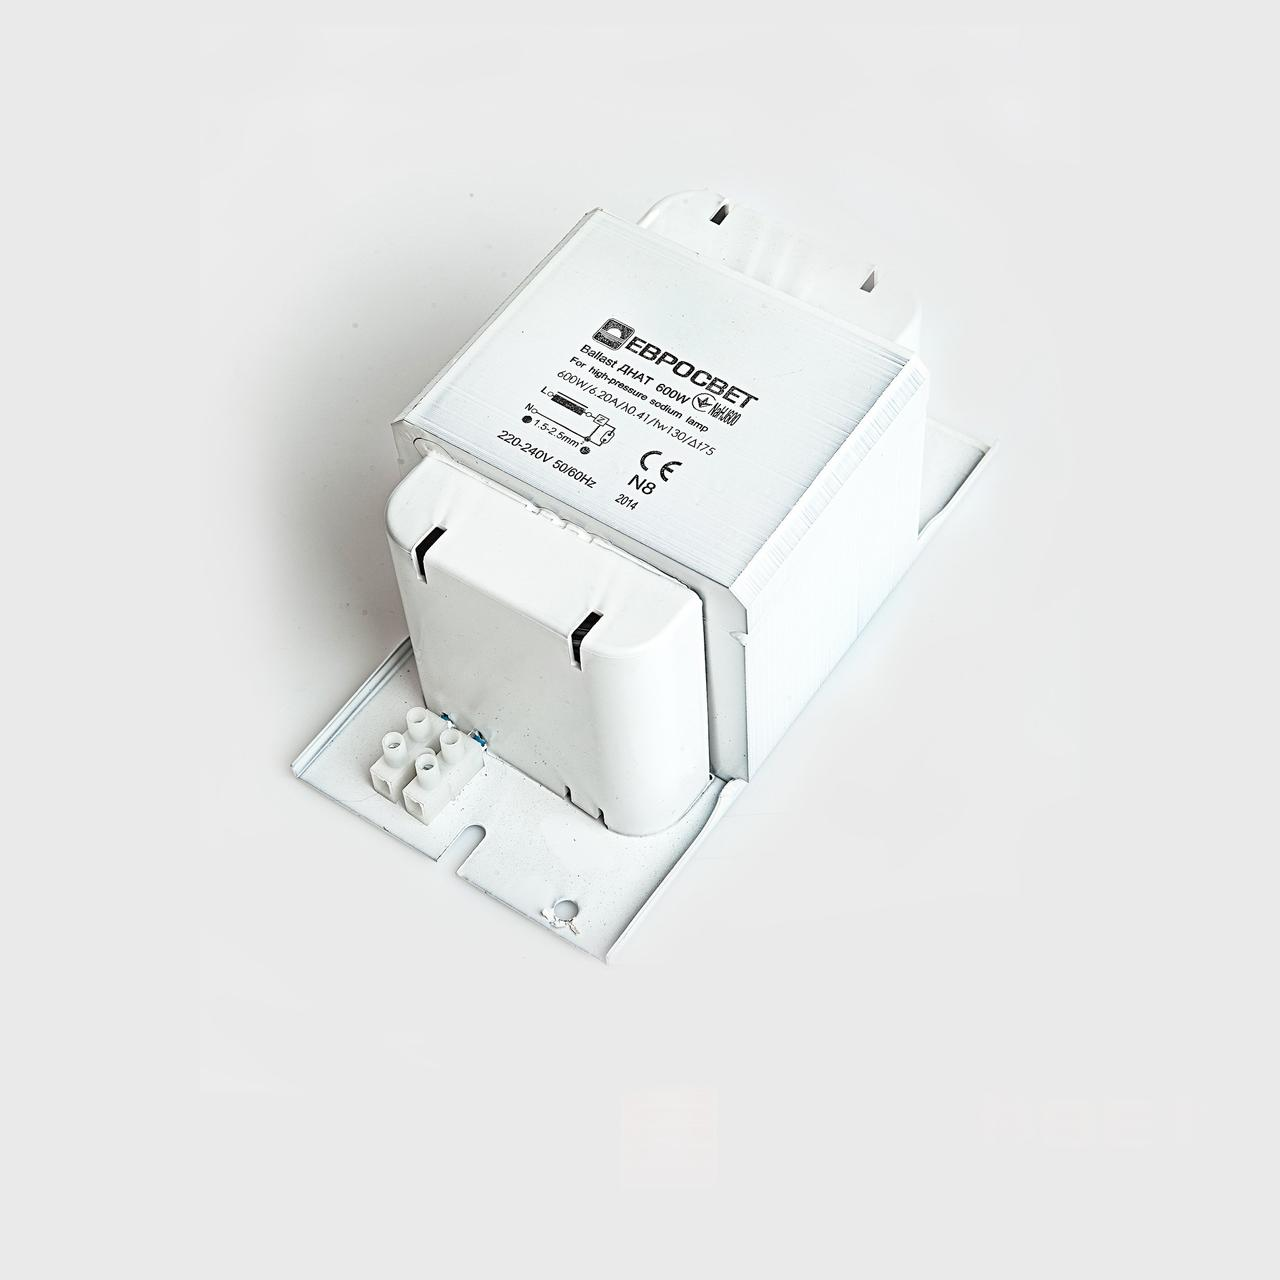 Балласт под натриевую лампу ДНаТ 600Вт